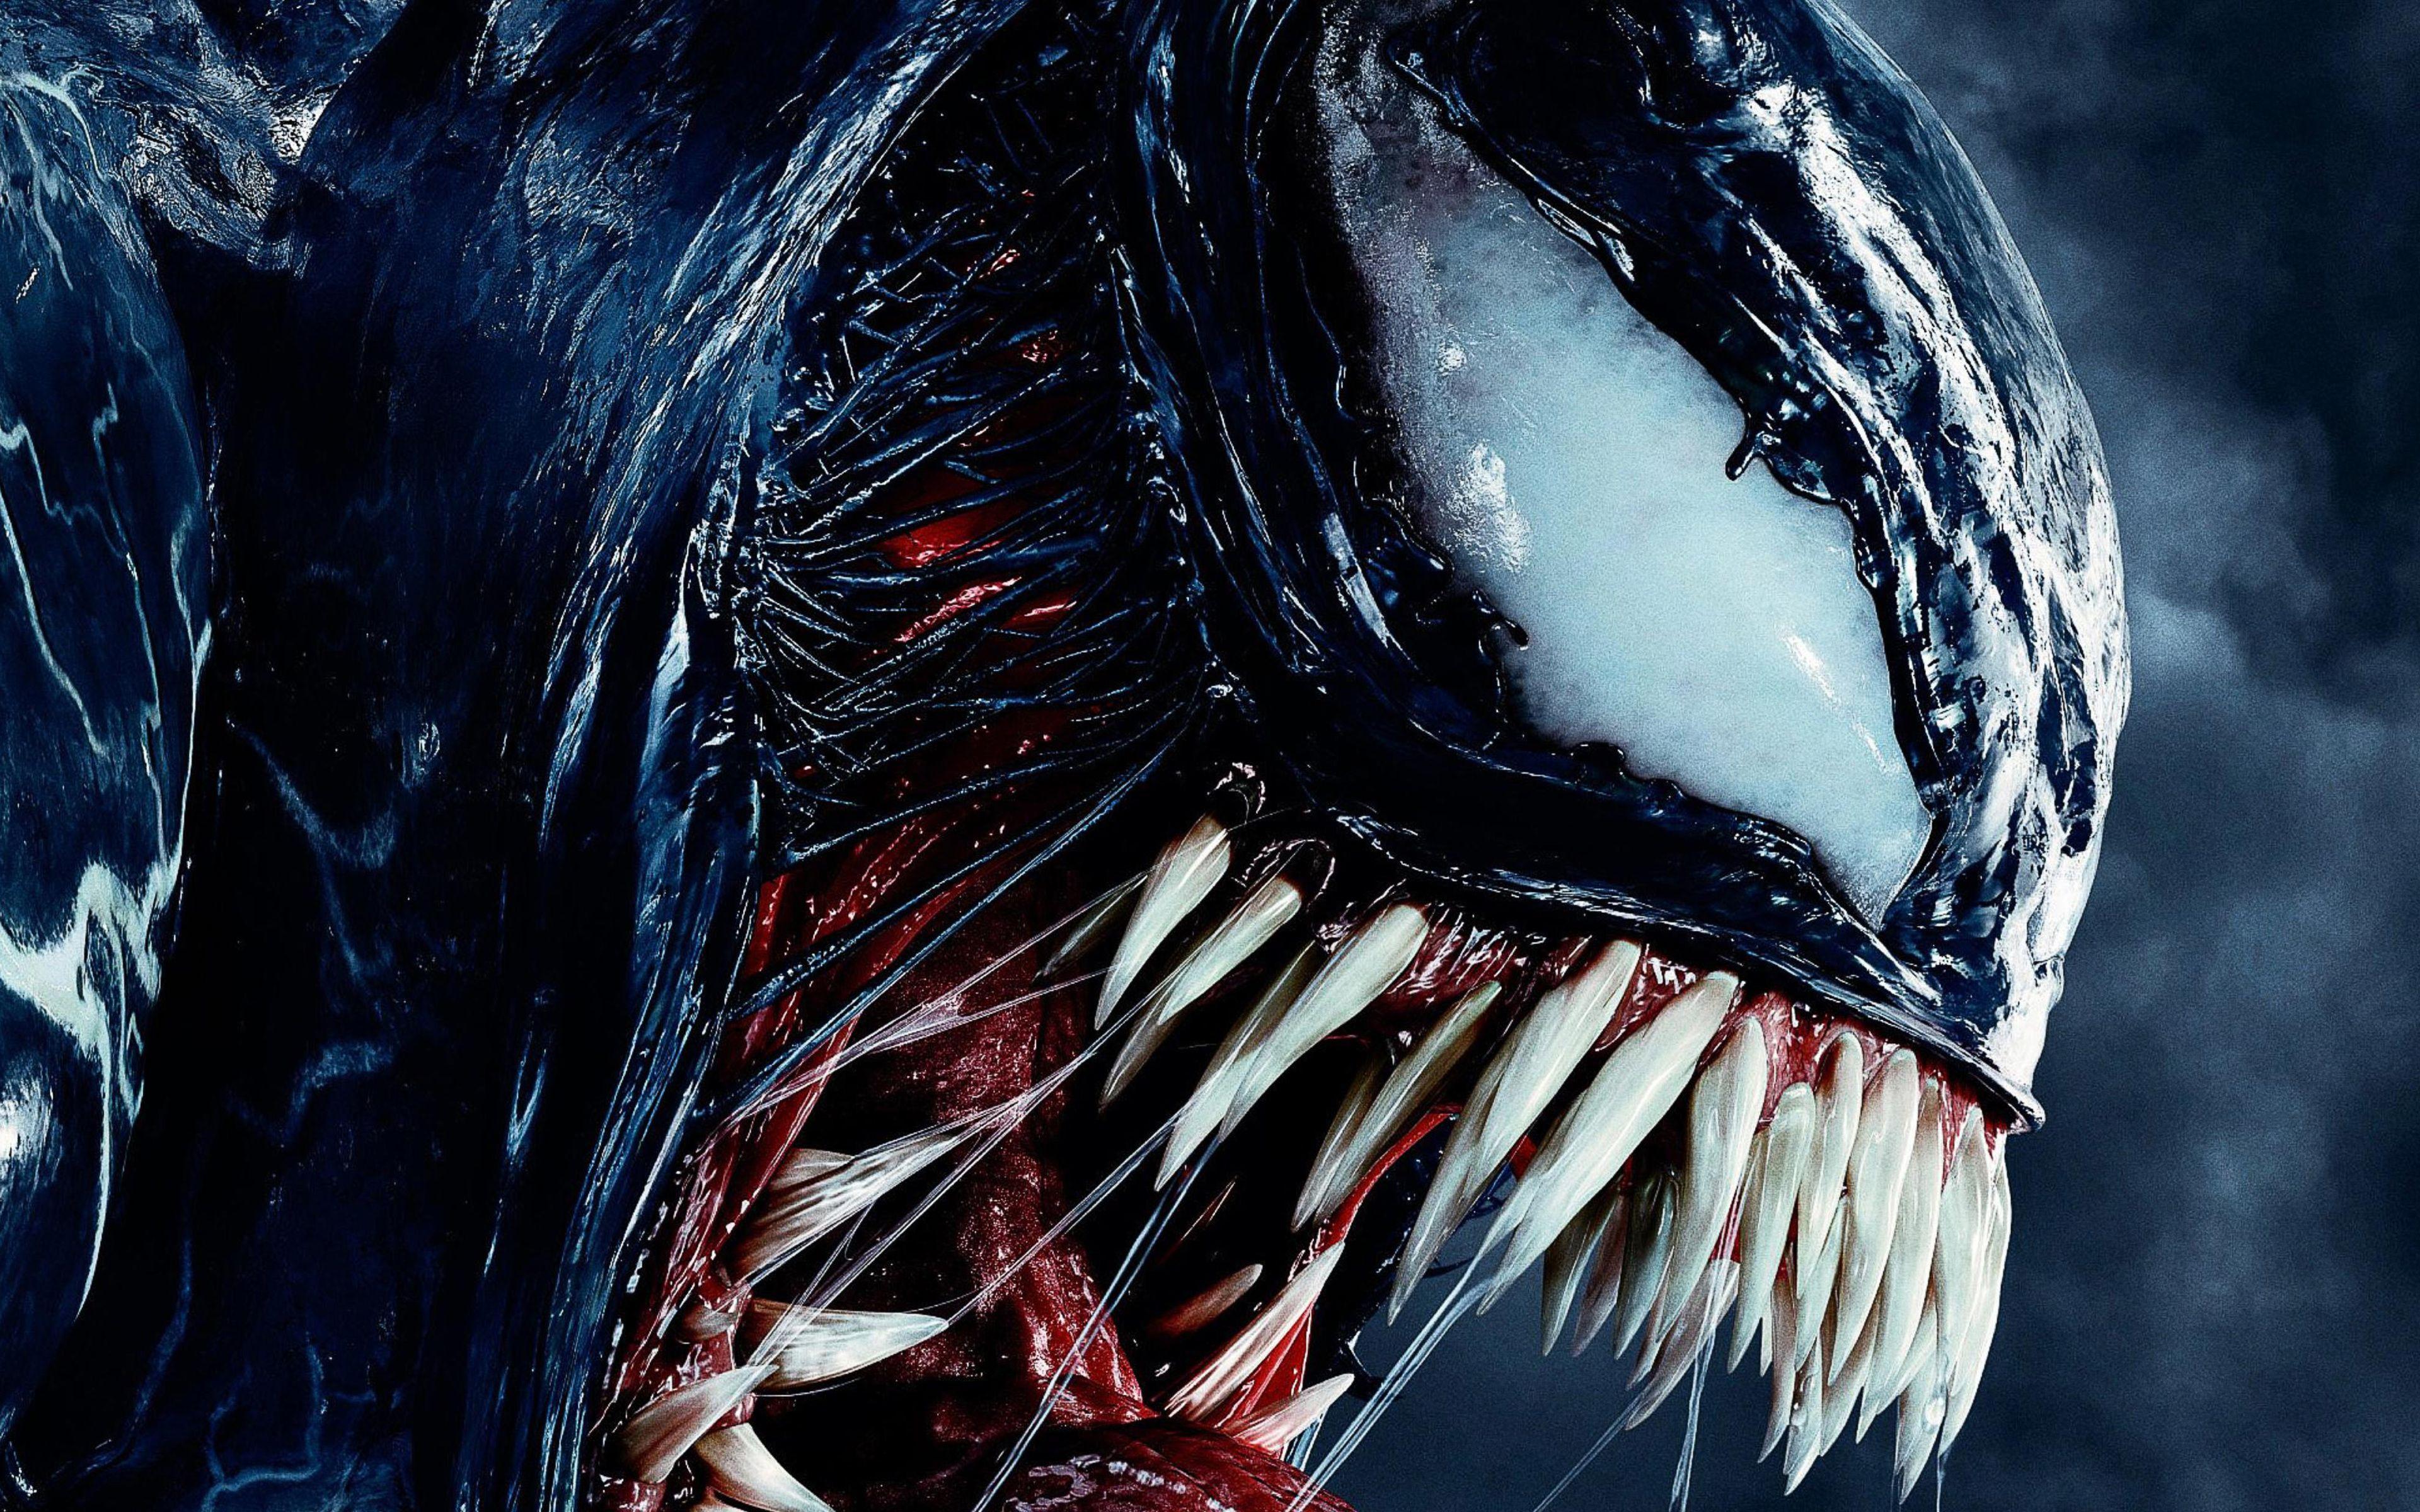 Venom Hd Wallpapers Top Free Venom Hd Backgrounds Wallpaperaccess